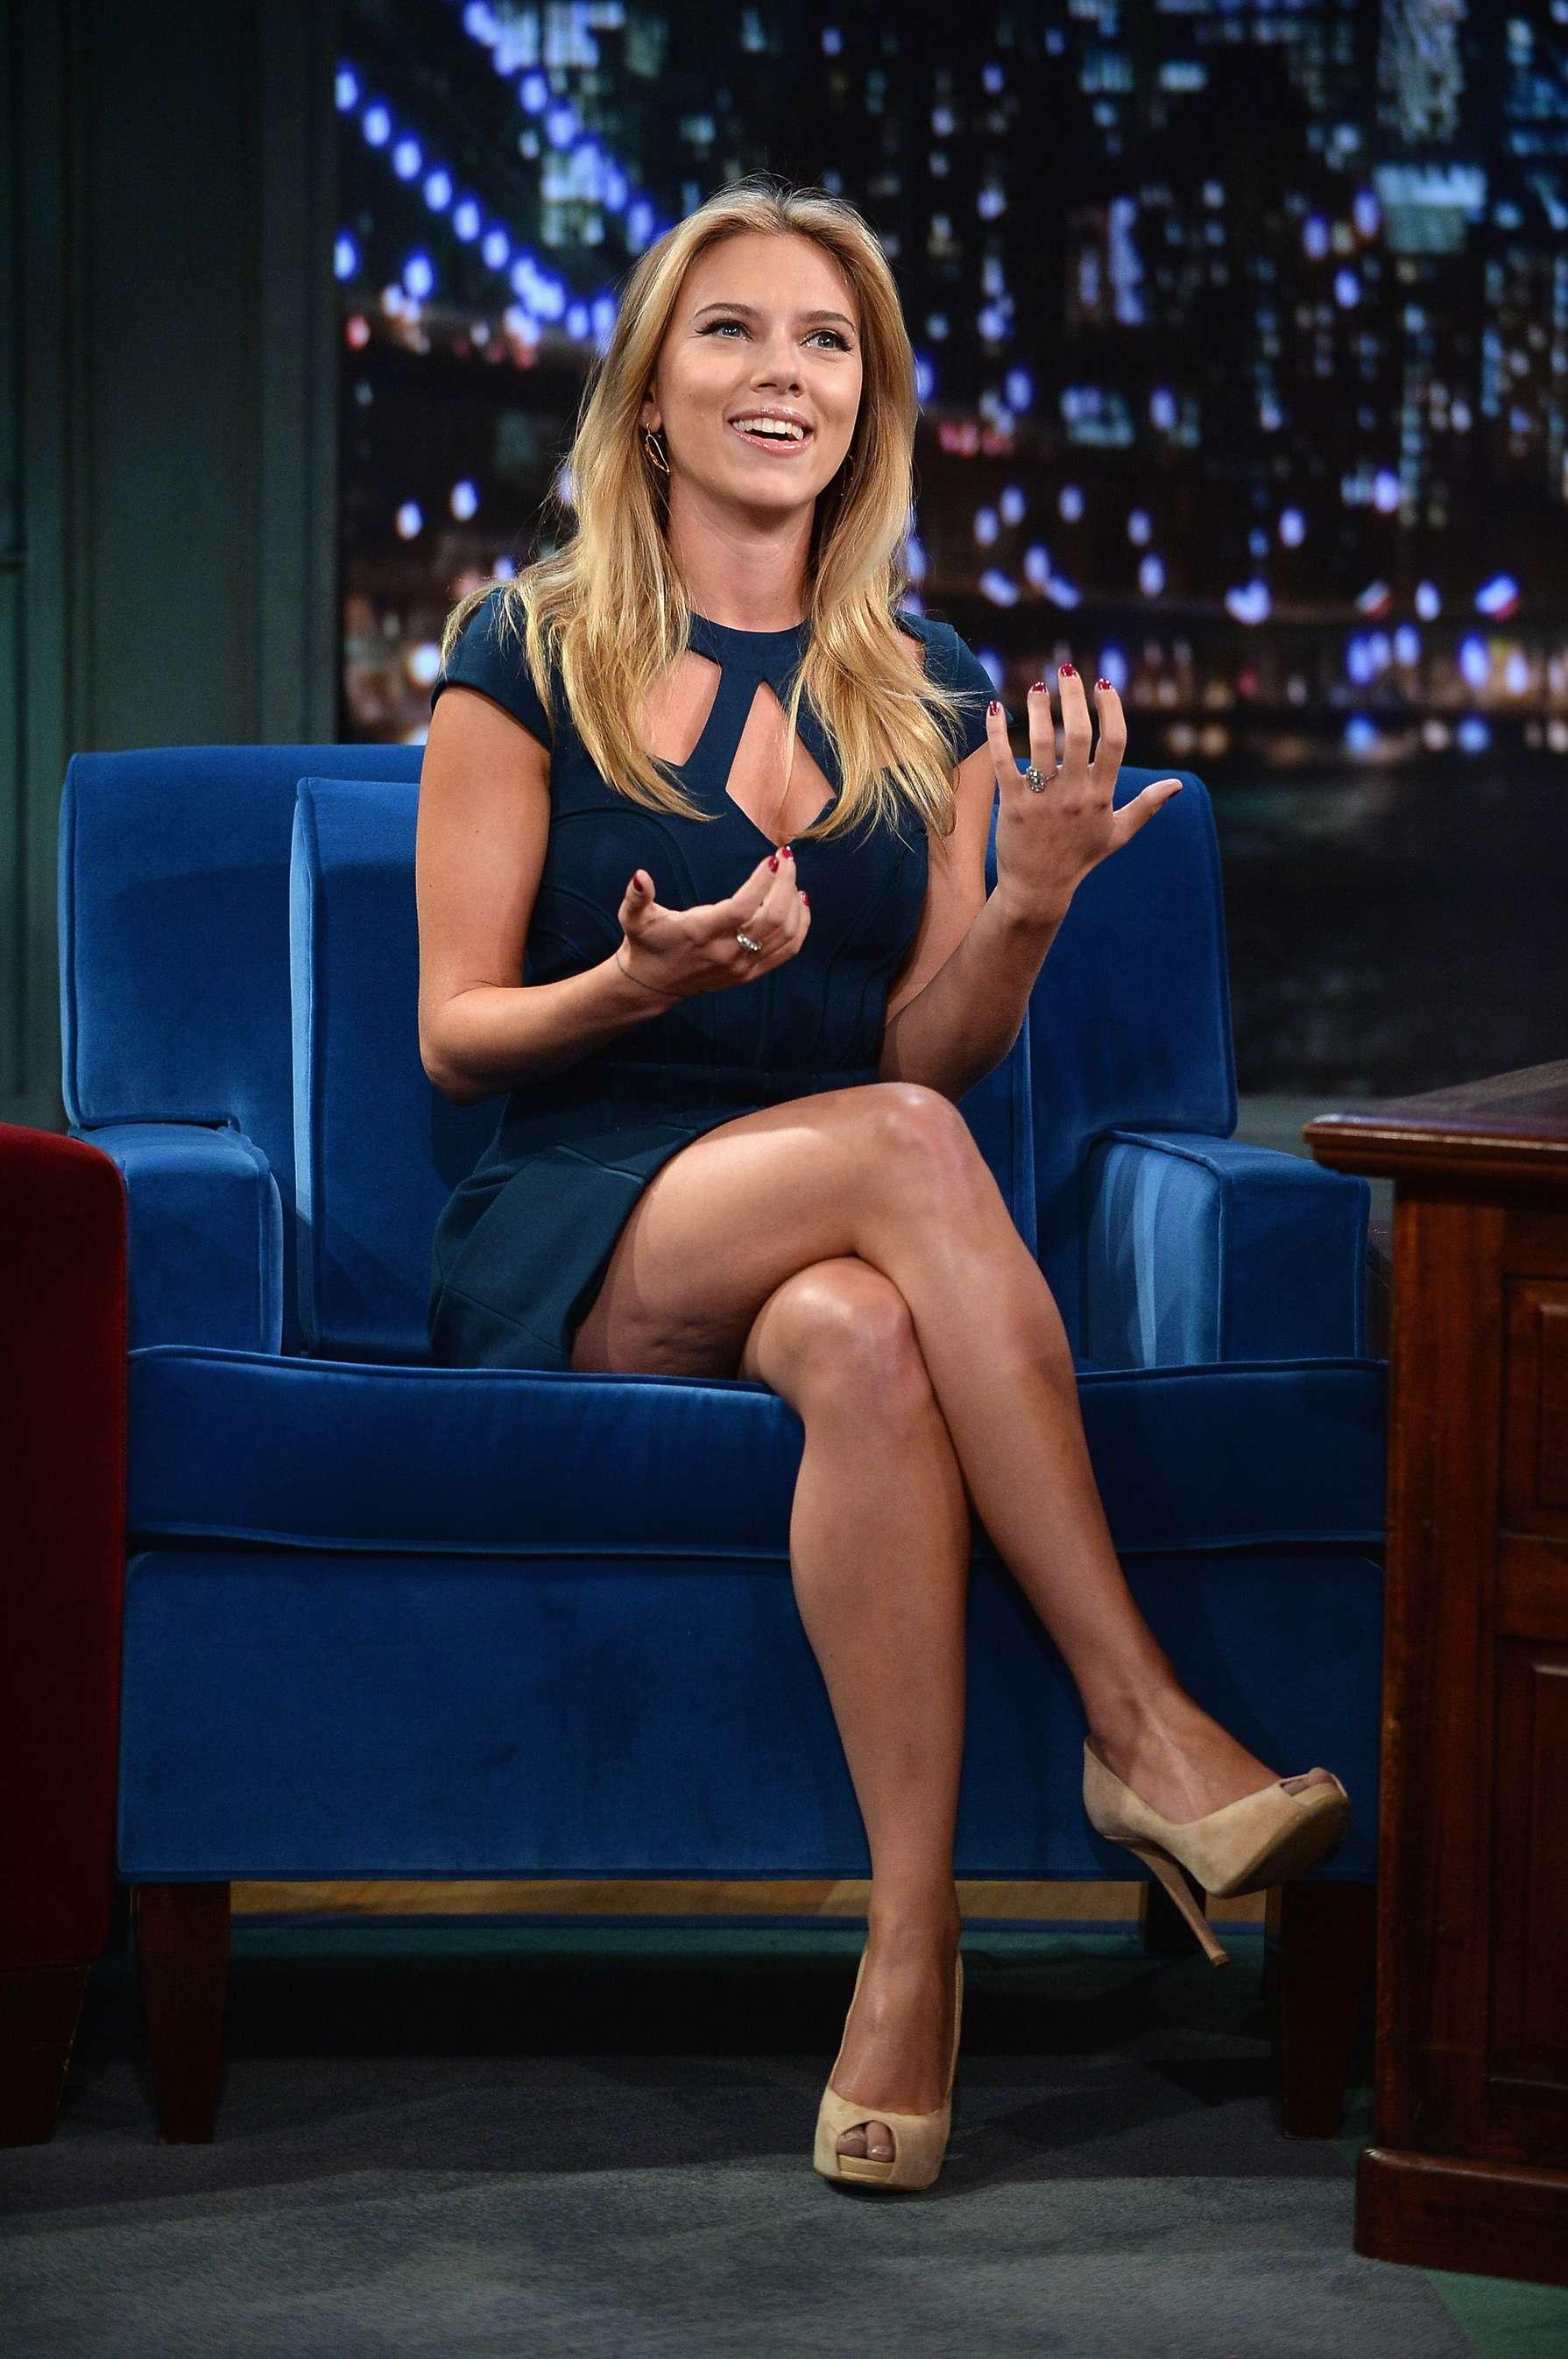 Scarlett Johansson at Jimmy Fallon 2013 -15 | GotCeleb скарлетт йоханссон